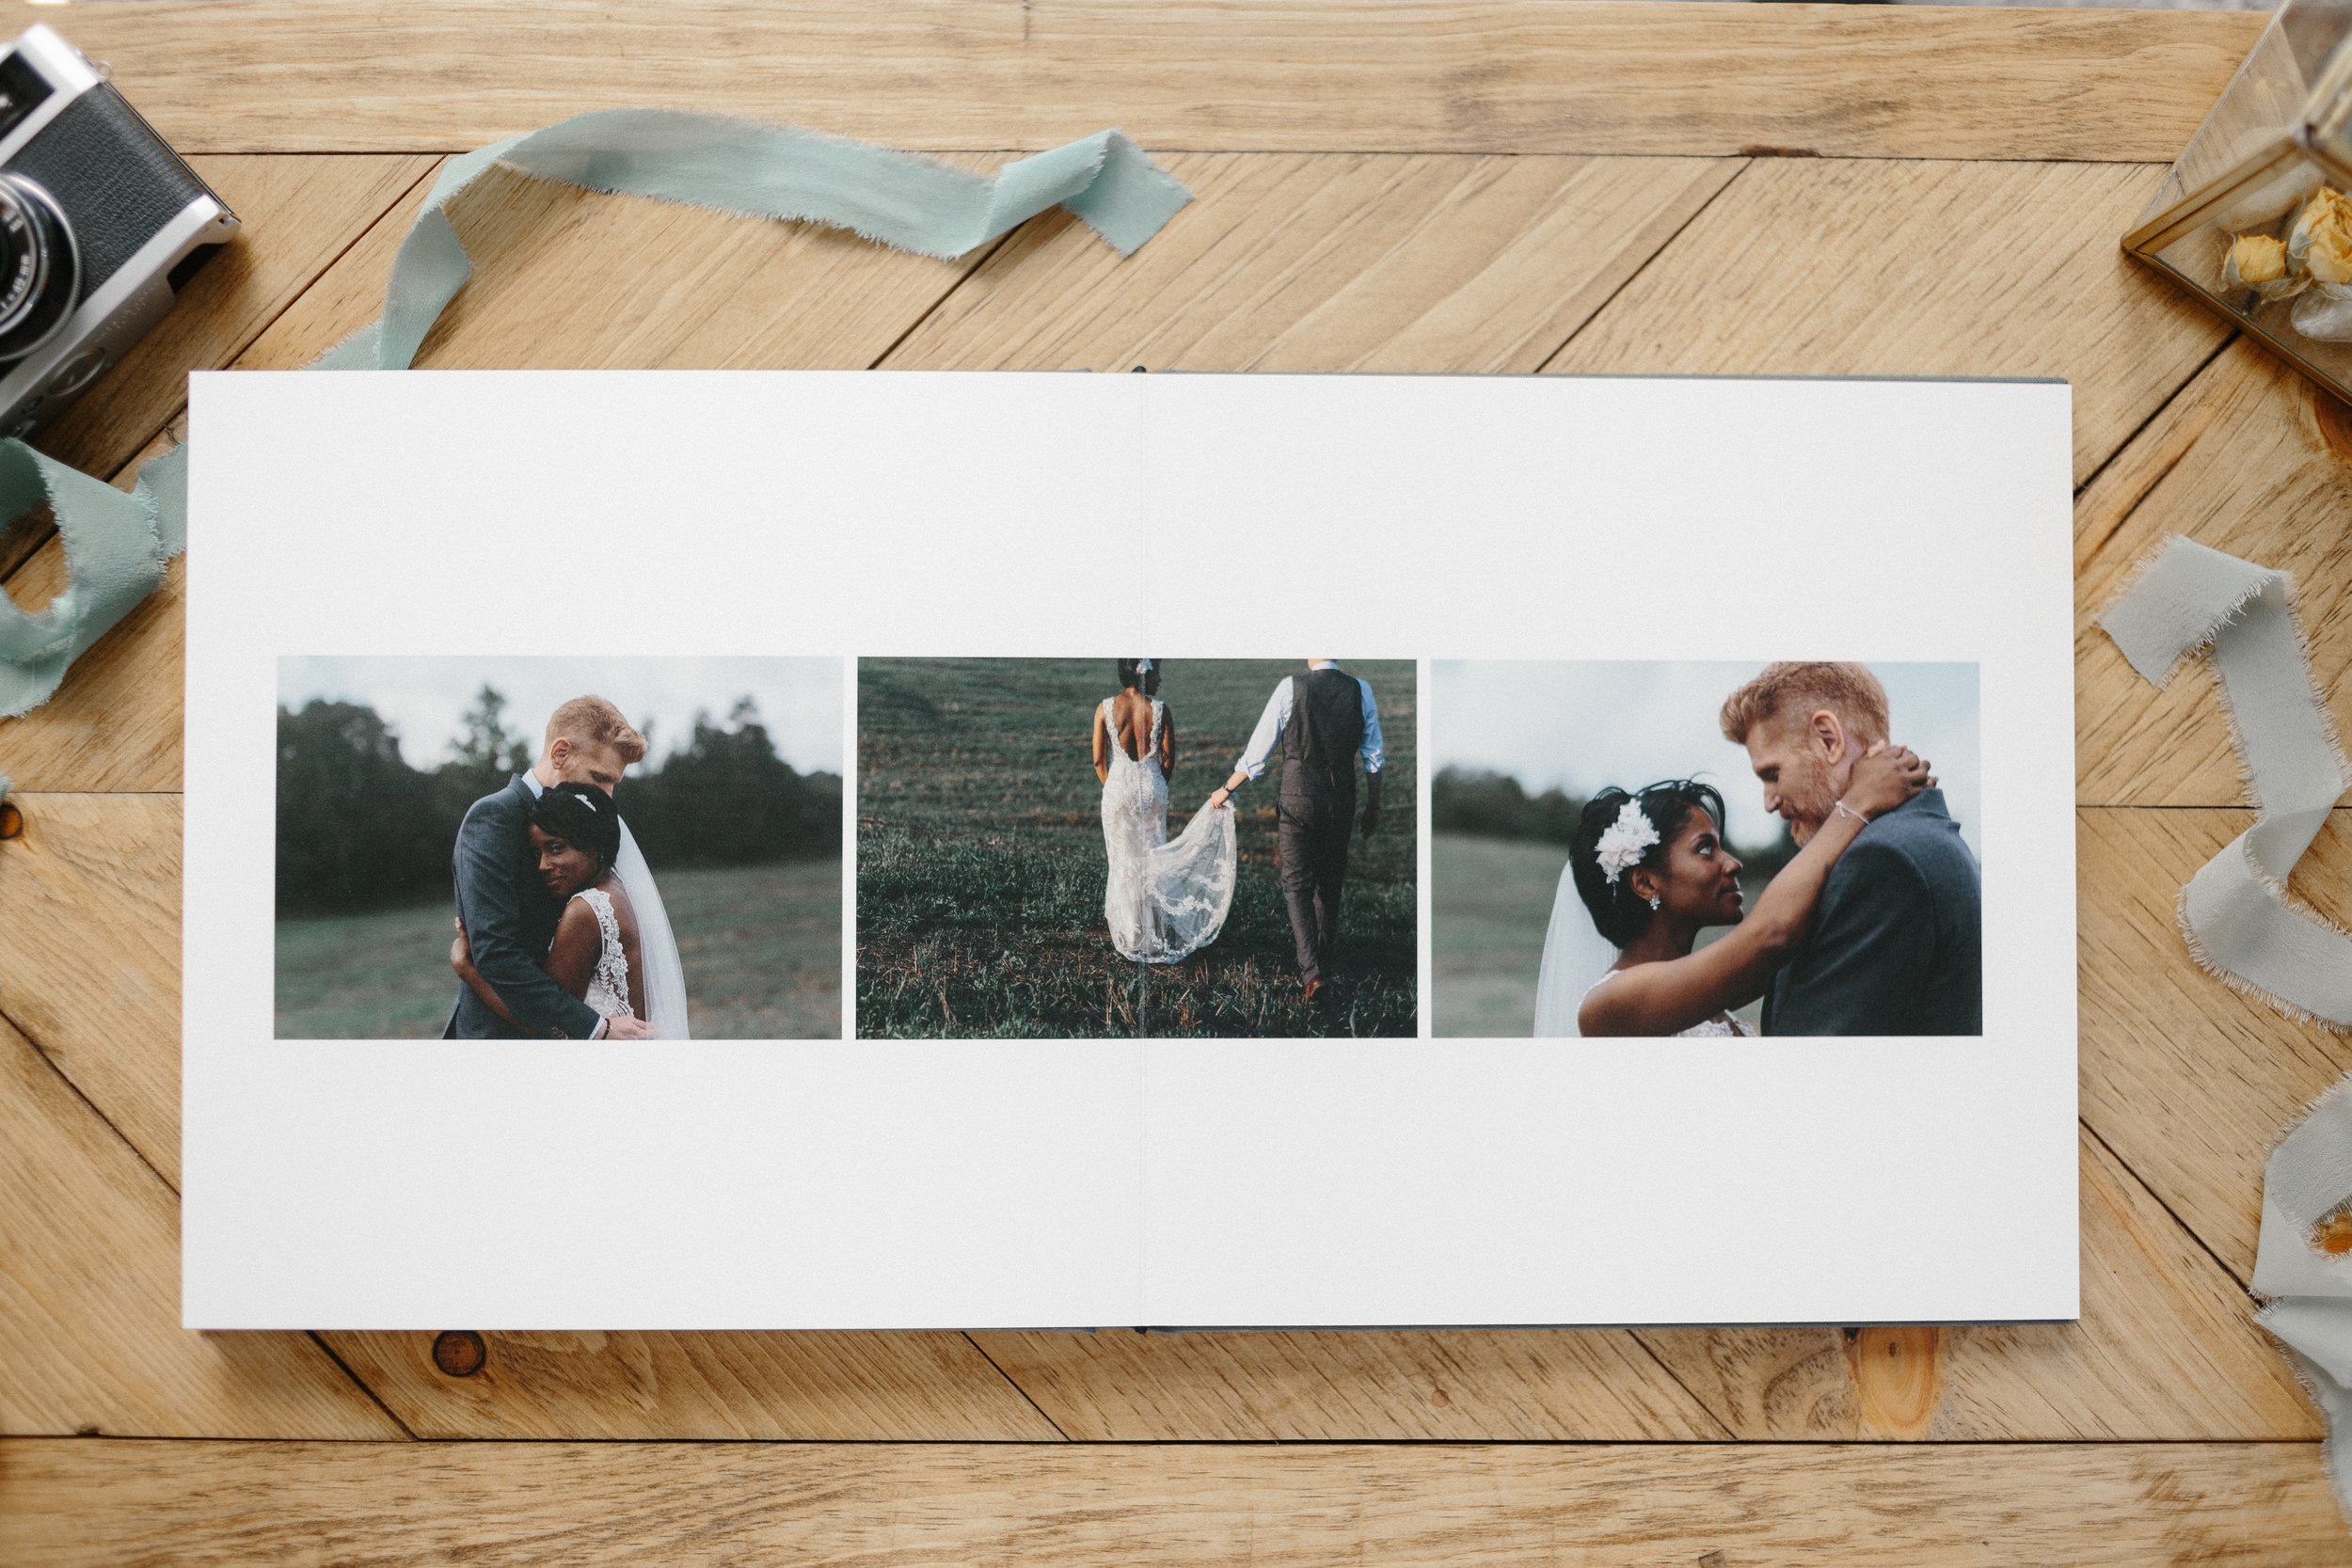 ryanne-hollies-photography-wedding-album-design-details-tono-and-co-artifact-uprising-75.jpg